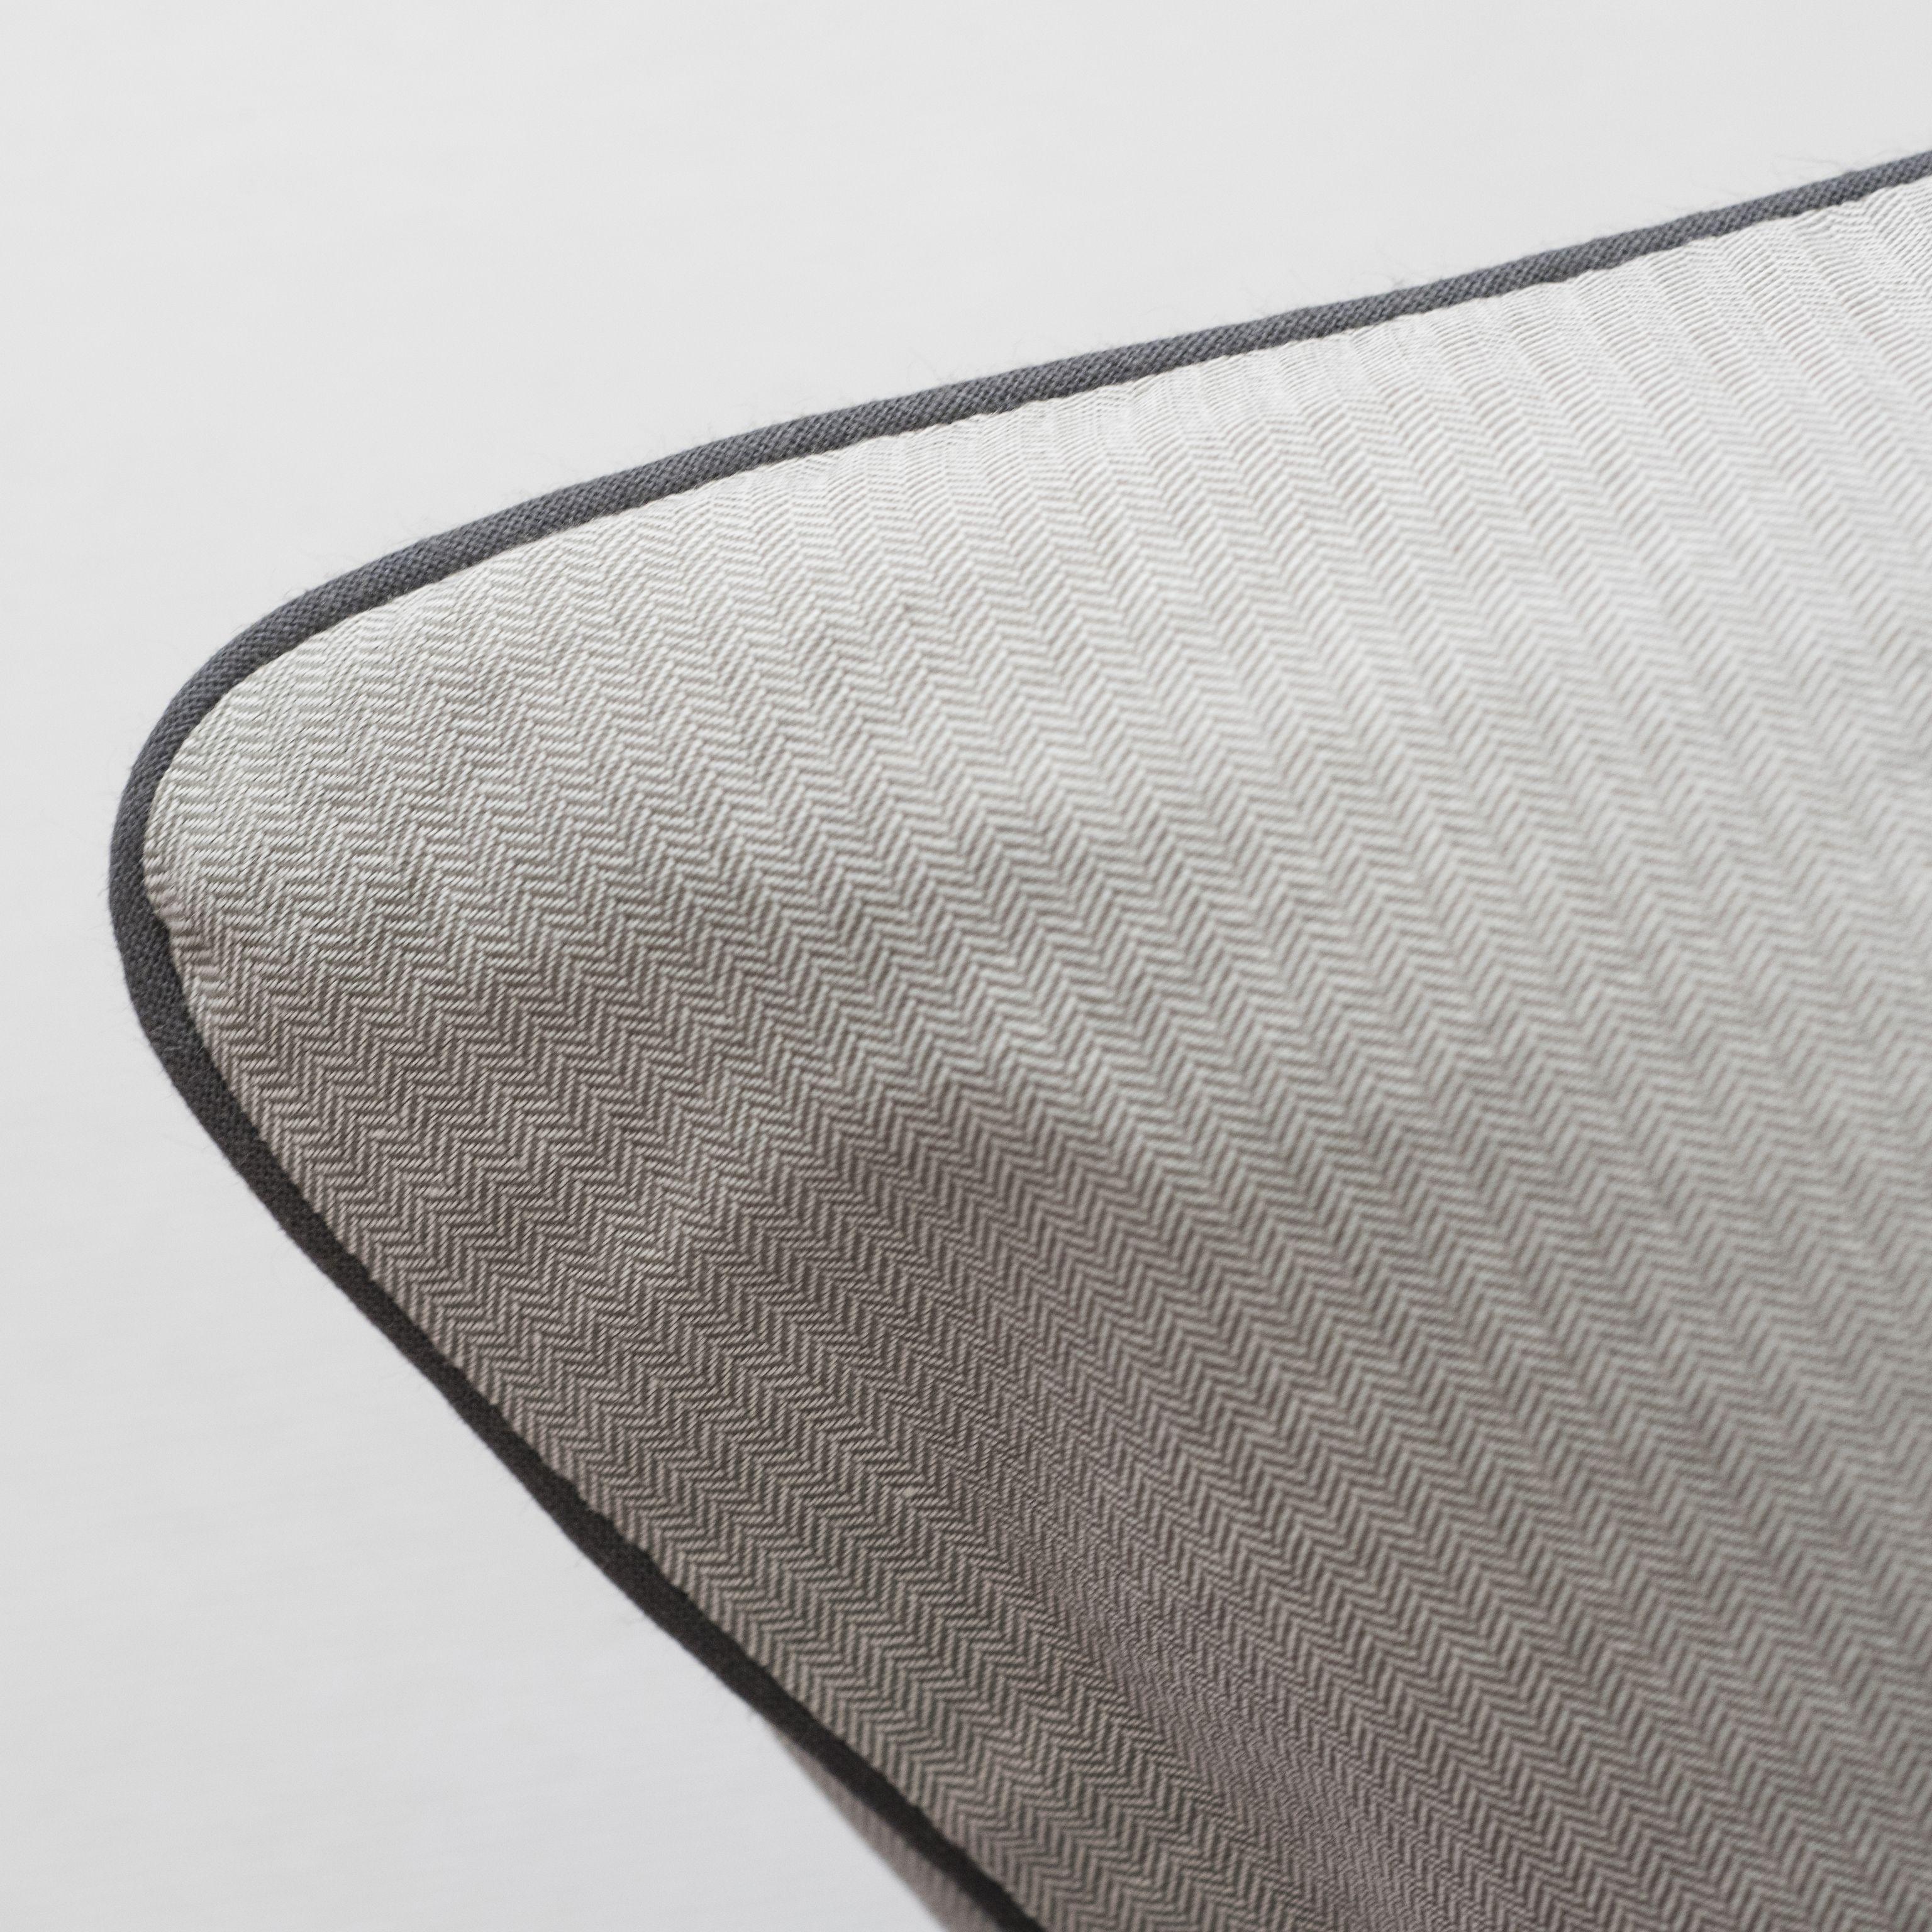 torquato kissenbezug herringbone 40 x 80 cm bei. Black Bedroom Furniture Sets. Home Design Ideas